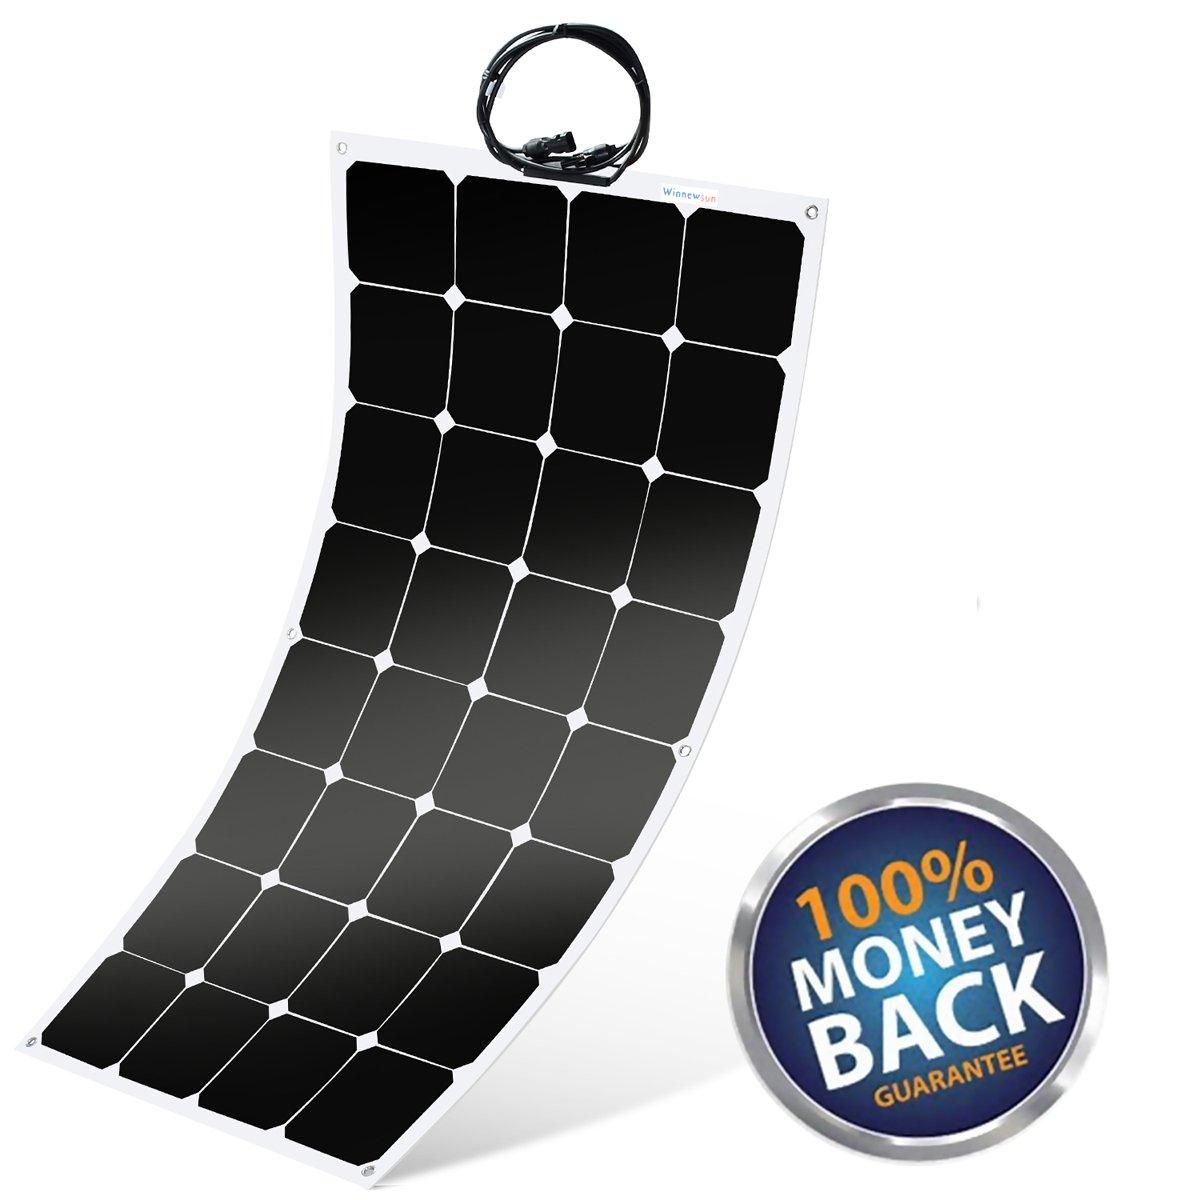 Flexible Solar Panel ,SunPower Solar Panel 100w 18V 12V ,Lightweight Flexible Solar Power Panels for RV Boat Truck Car Van Tent by Winnewsun (Image #8)